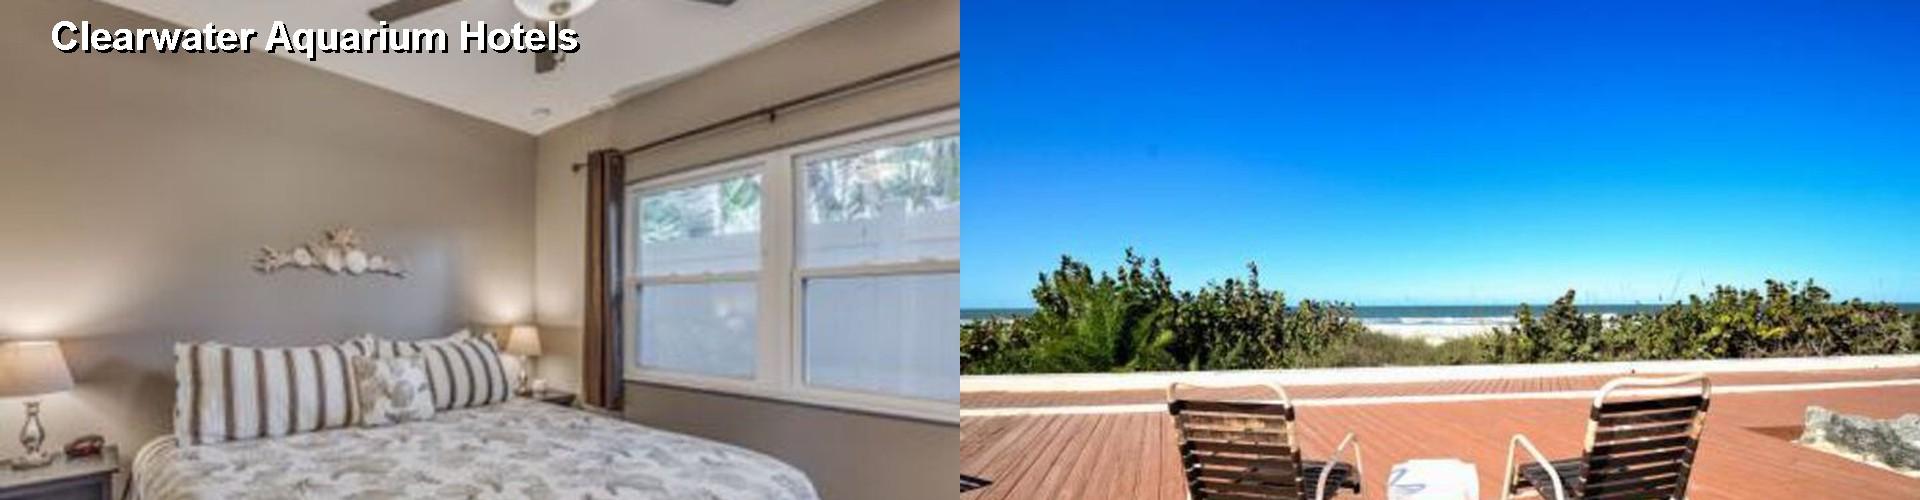 5 Best Hotels Near Clearwater Aquarium